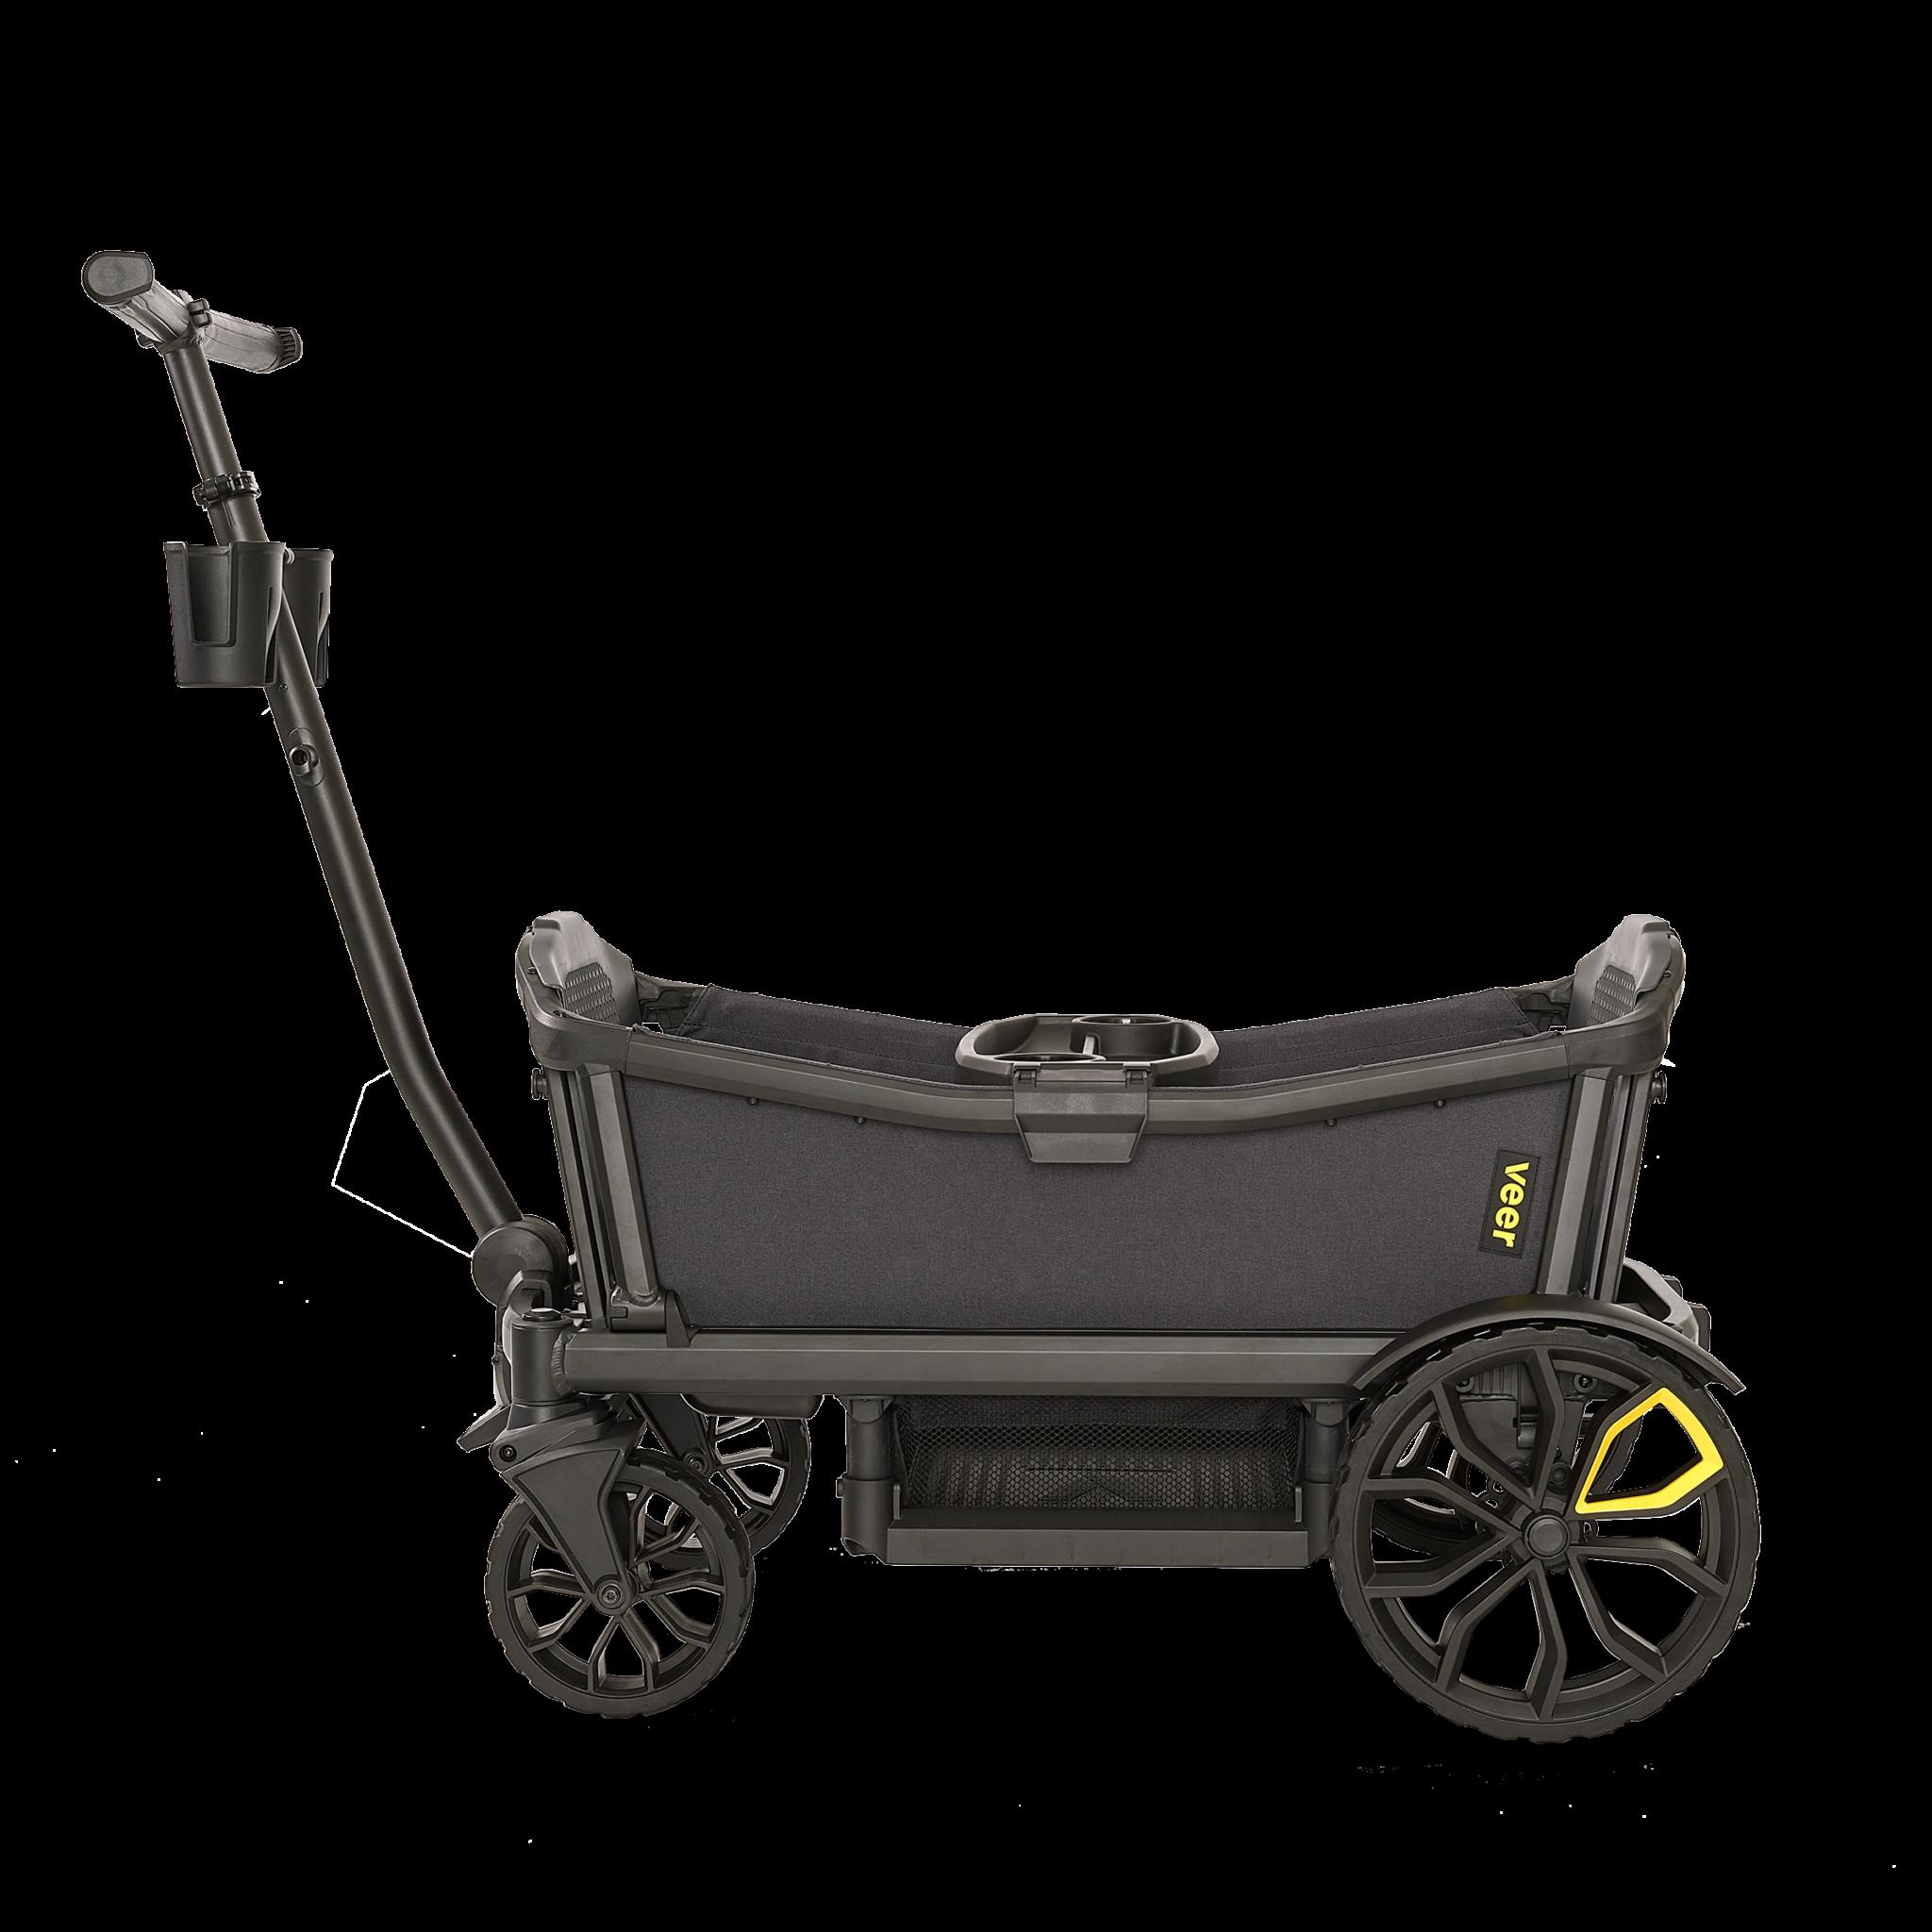 Cruiser Stroller, Best wagons, Baby car seats